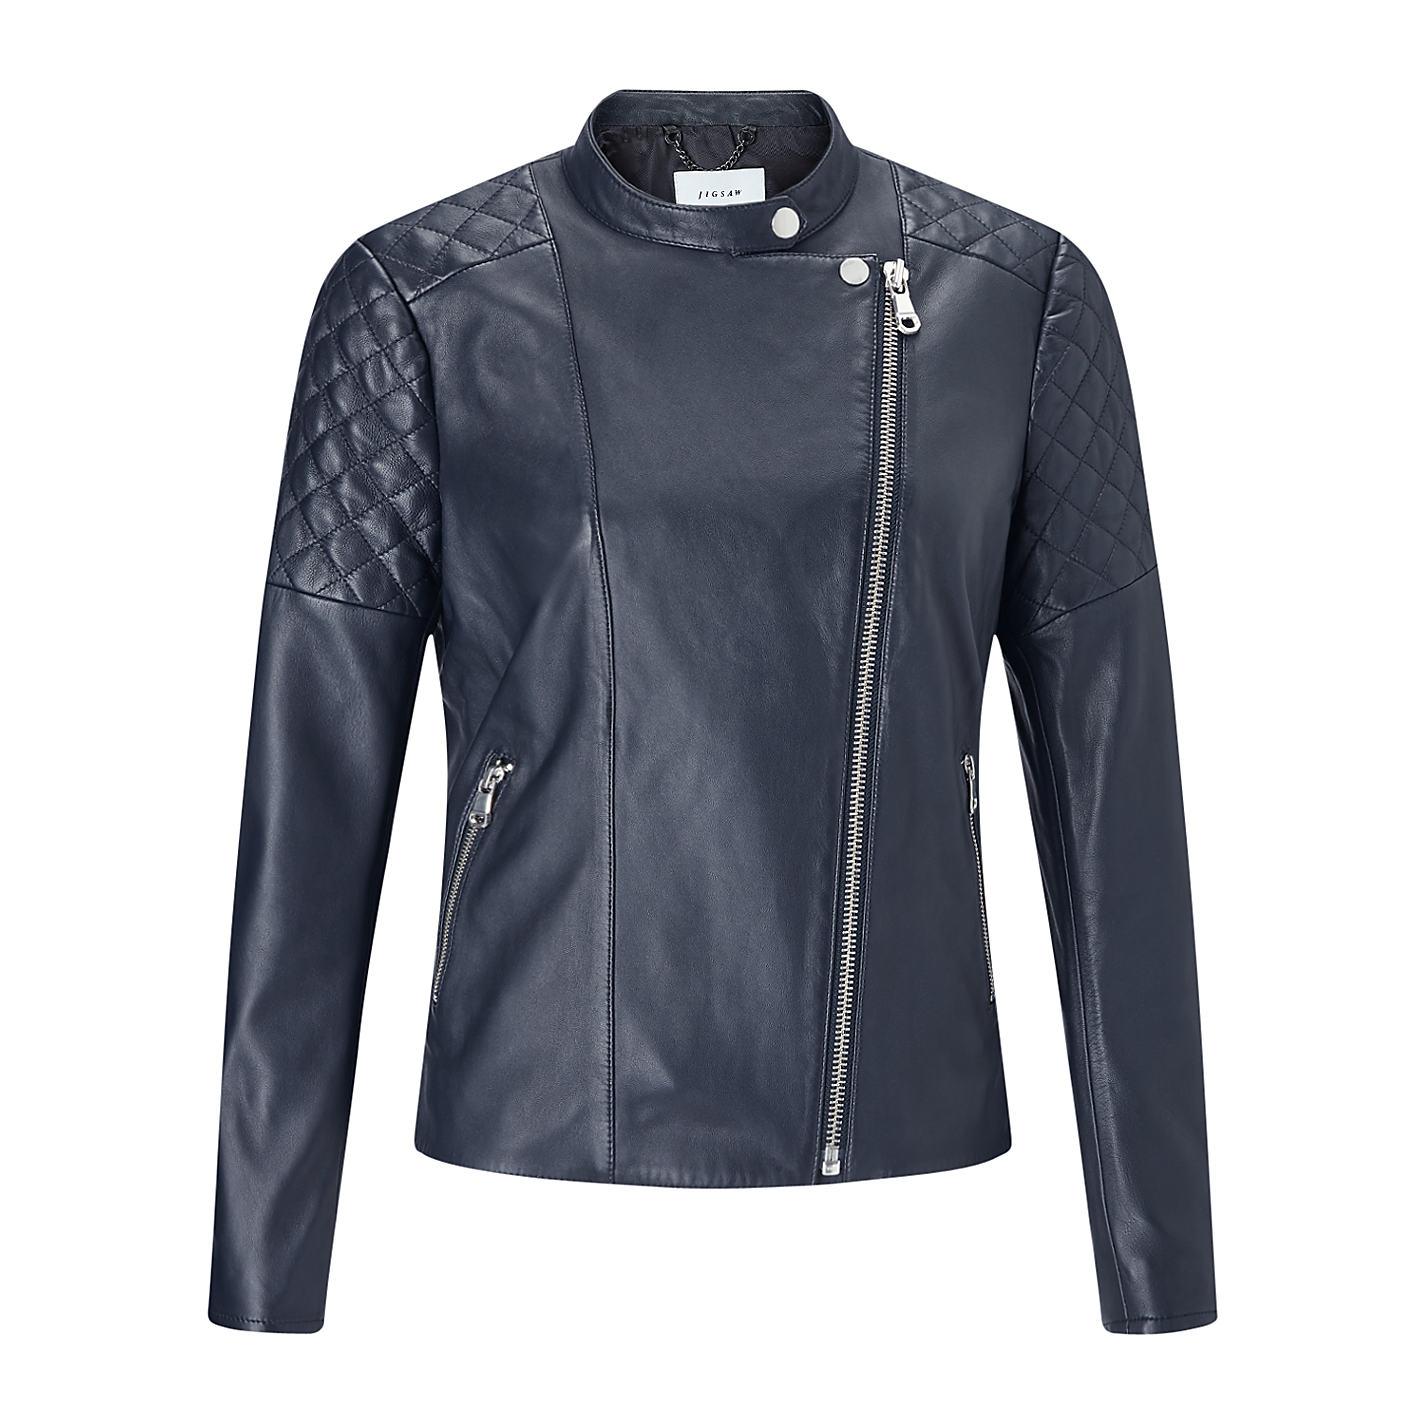 Leather jacket brisbane - Leather Jacket Repairs Brisbane